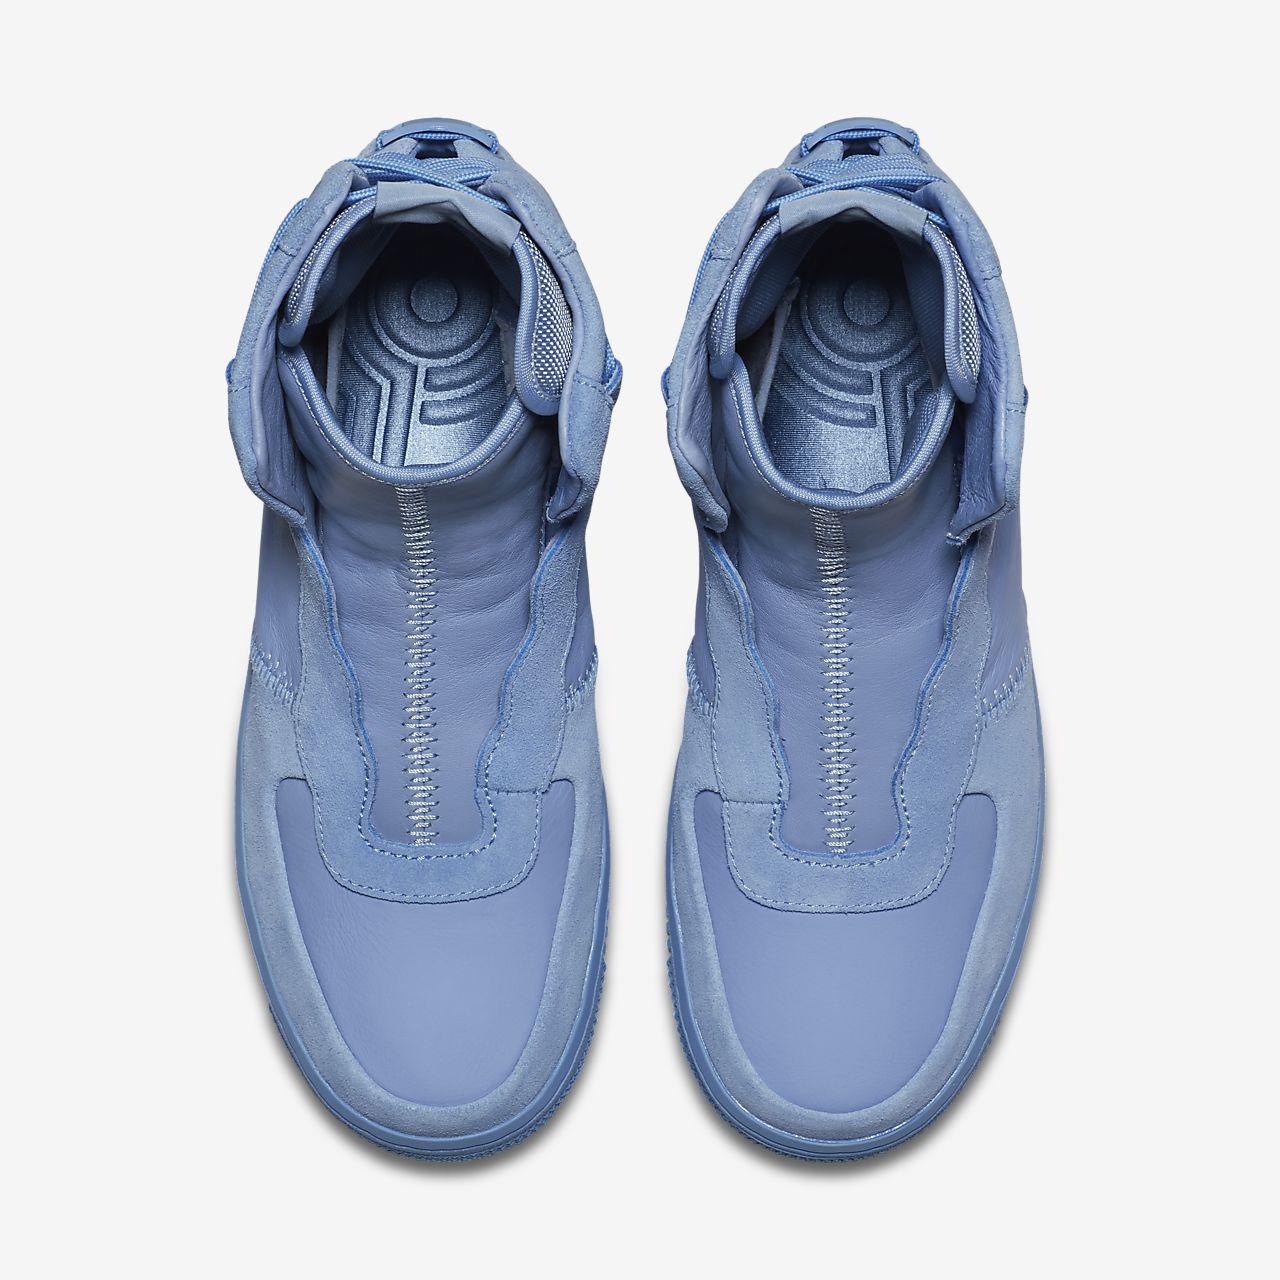 07dc3e61856 Nike AF-1 Rebel XX Women s Shoe. Nike.com AU